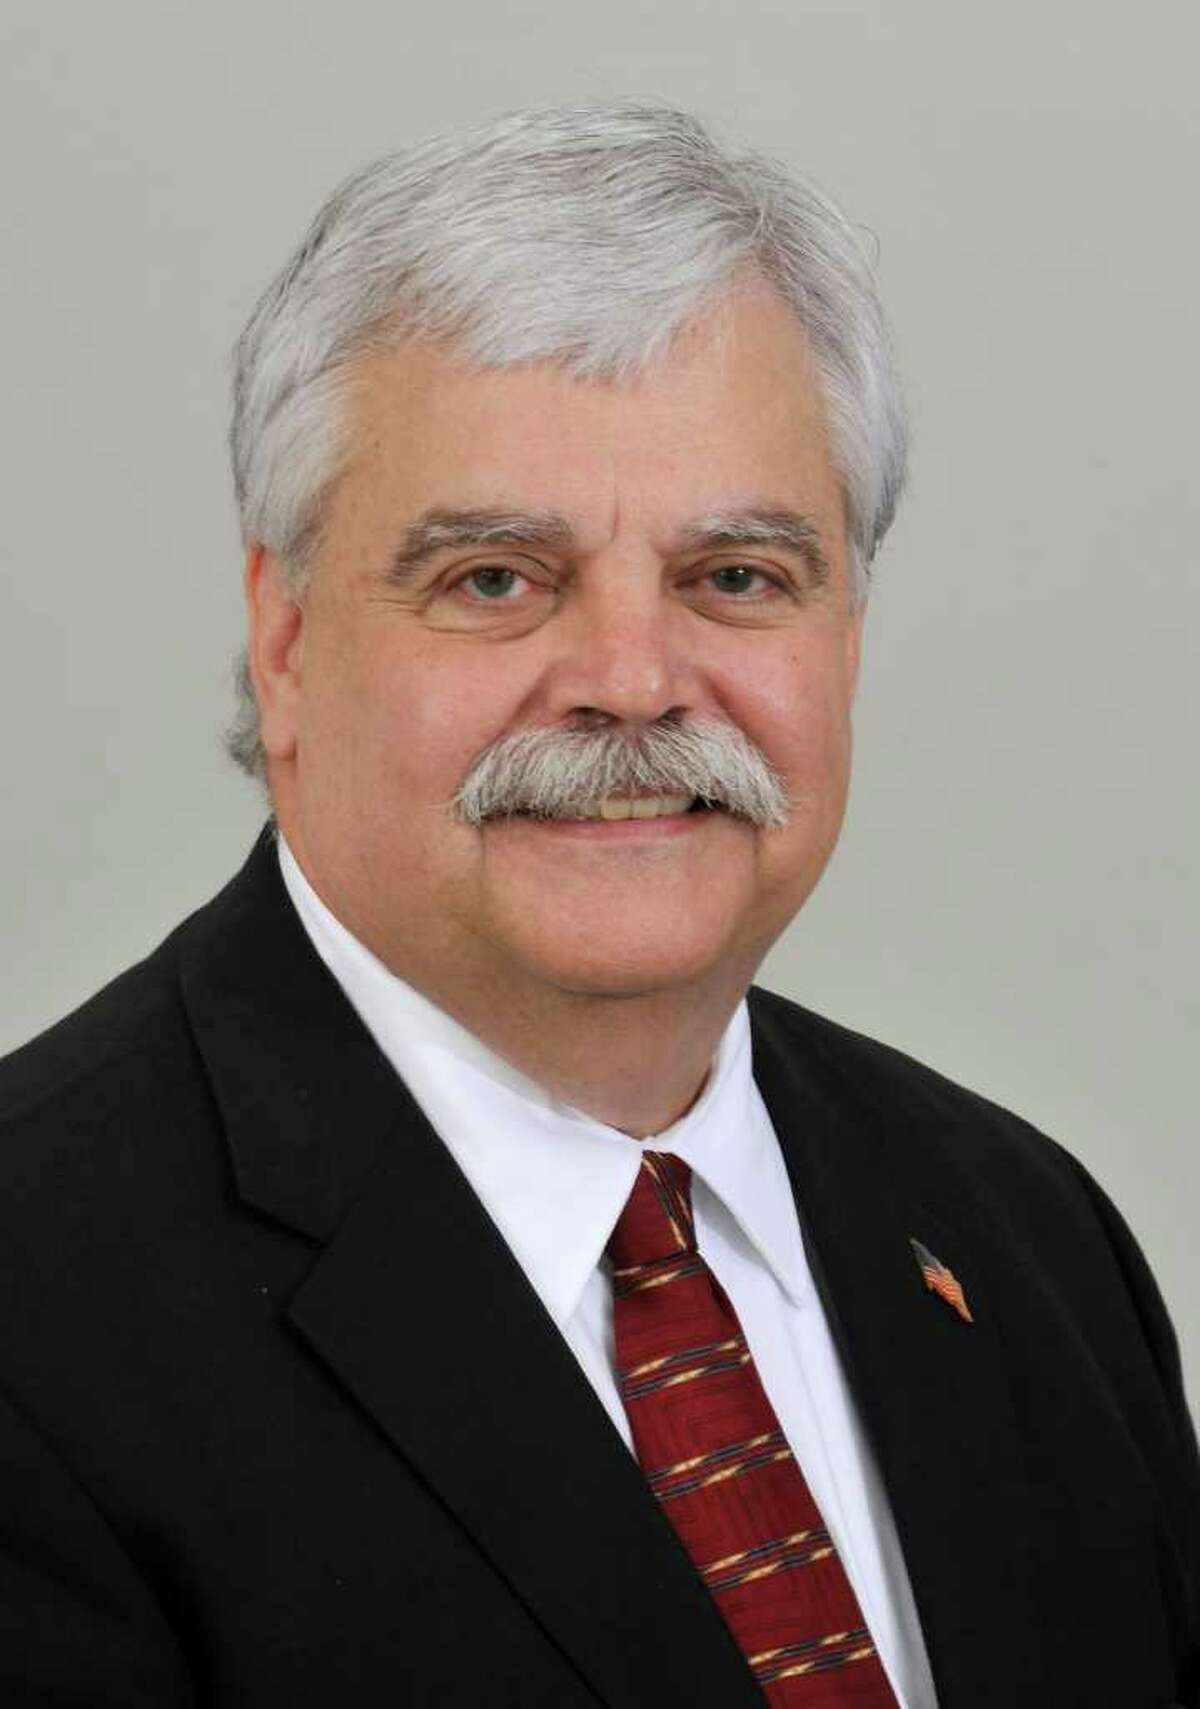 State Rep. Robert Godfrey, Democrat, 110th District.